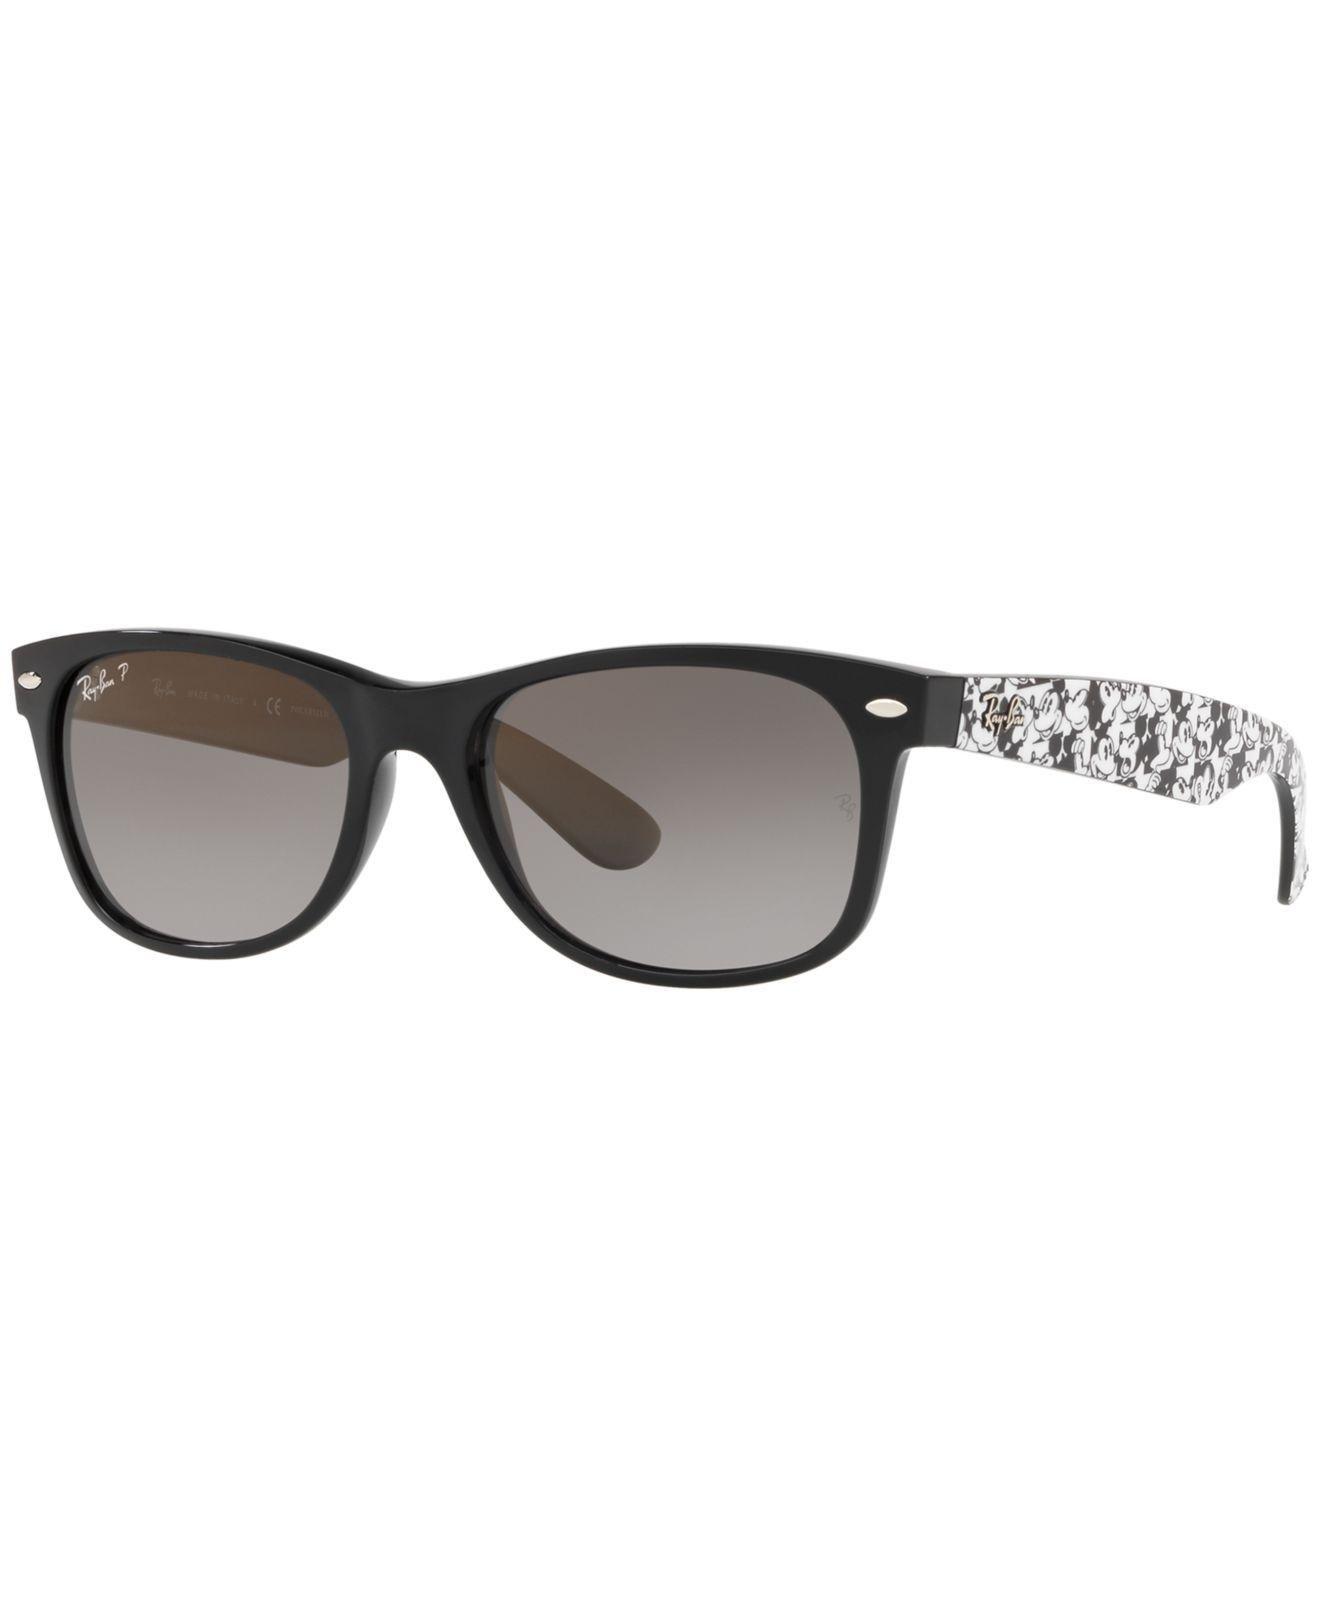 b46f2303a7bb8 Ray-Ban. Women s Black New Wayfarer Polarized Sunglasses ...